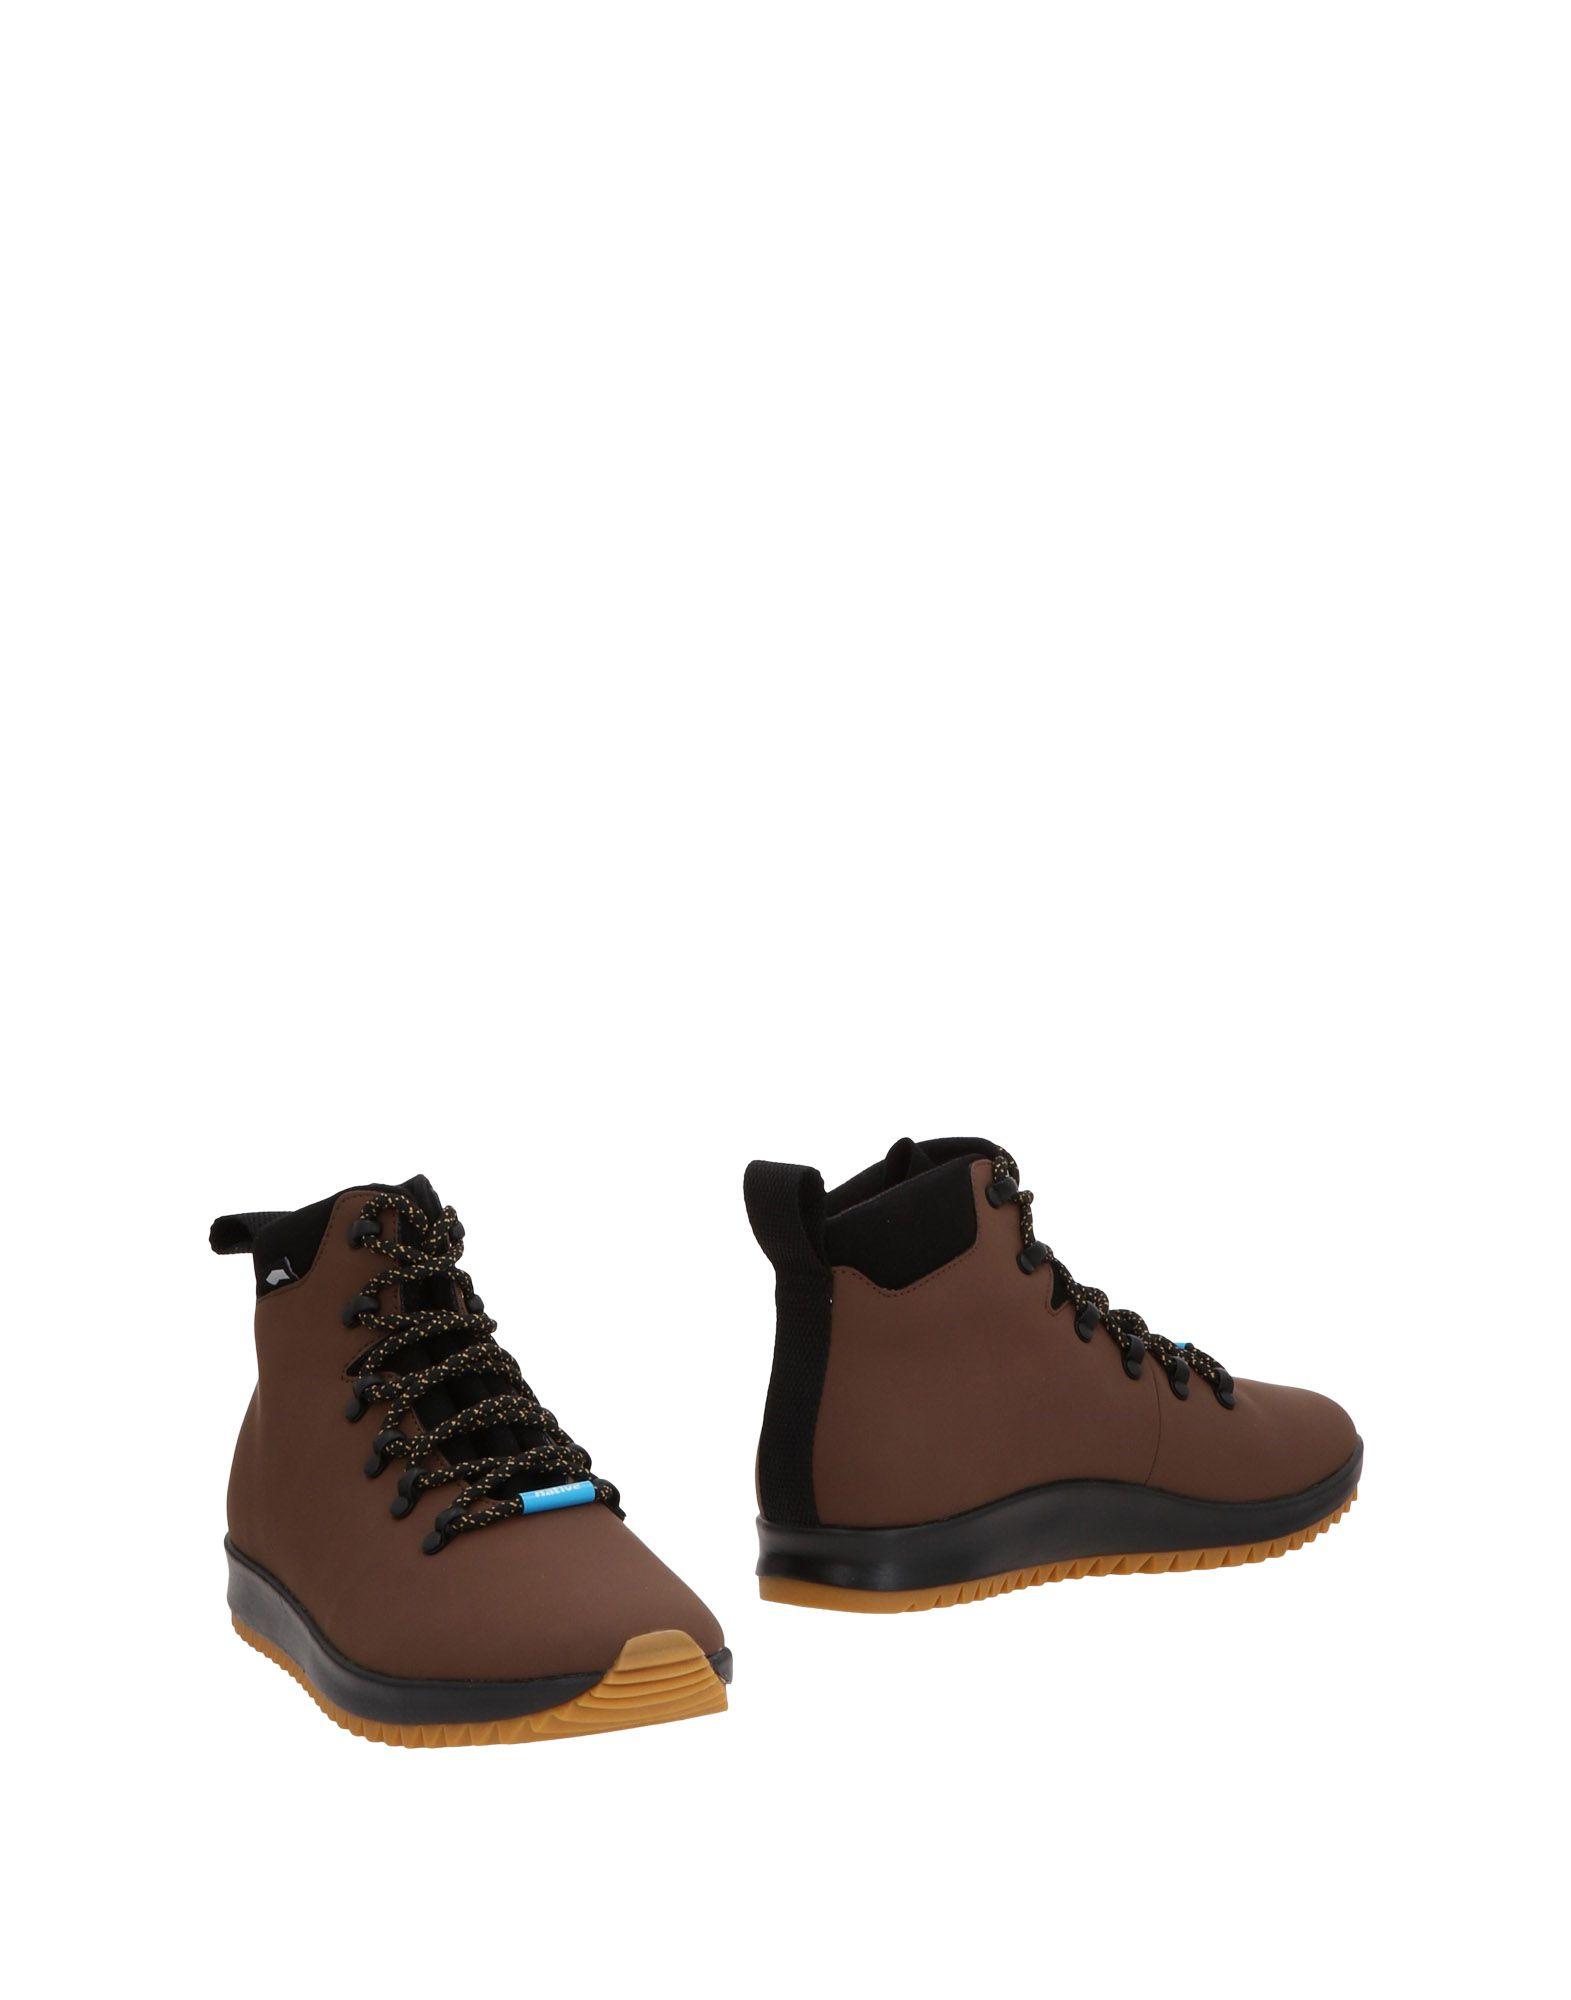 Rabatt echte Schuhe Herren Native Stiefelette Herren Schuhe  11473610MX 07af2b